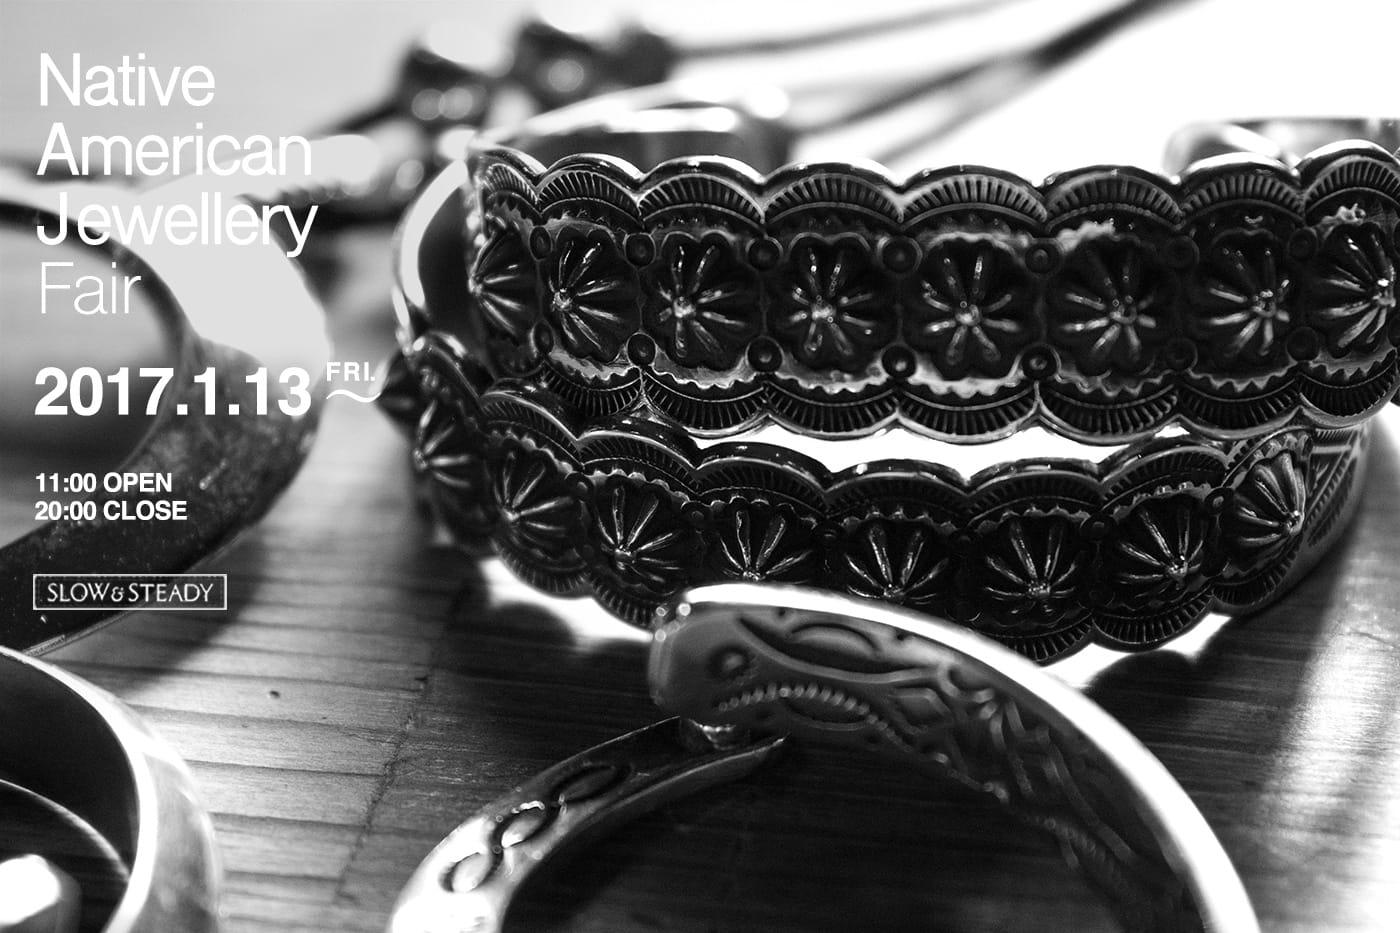 Native American Jewellery Fair 開催のお知らせ